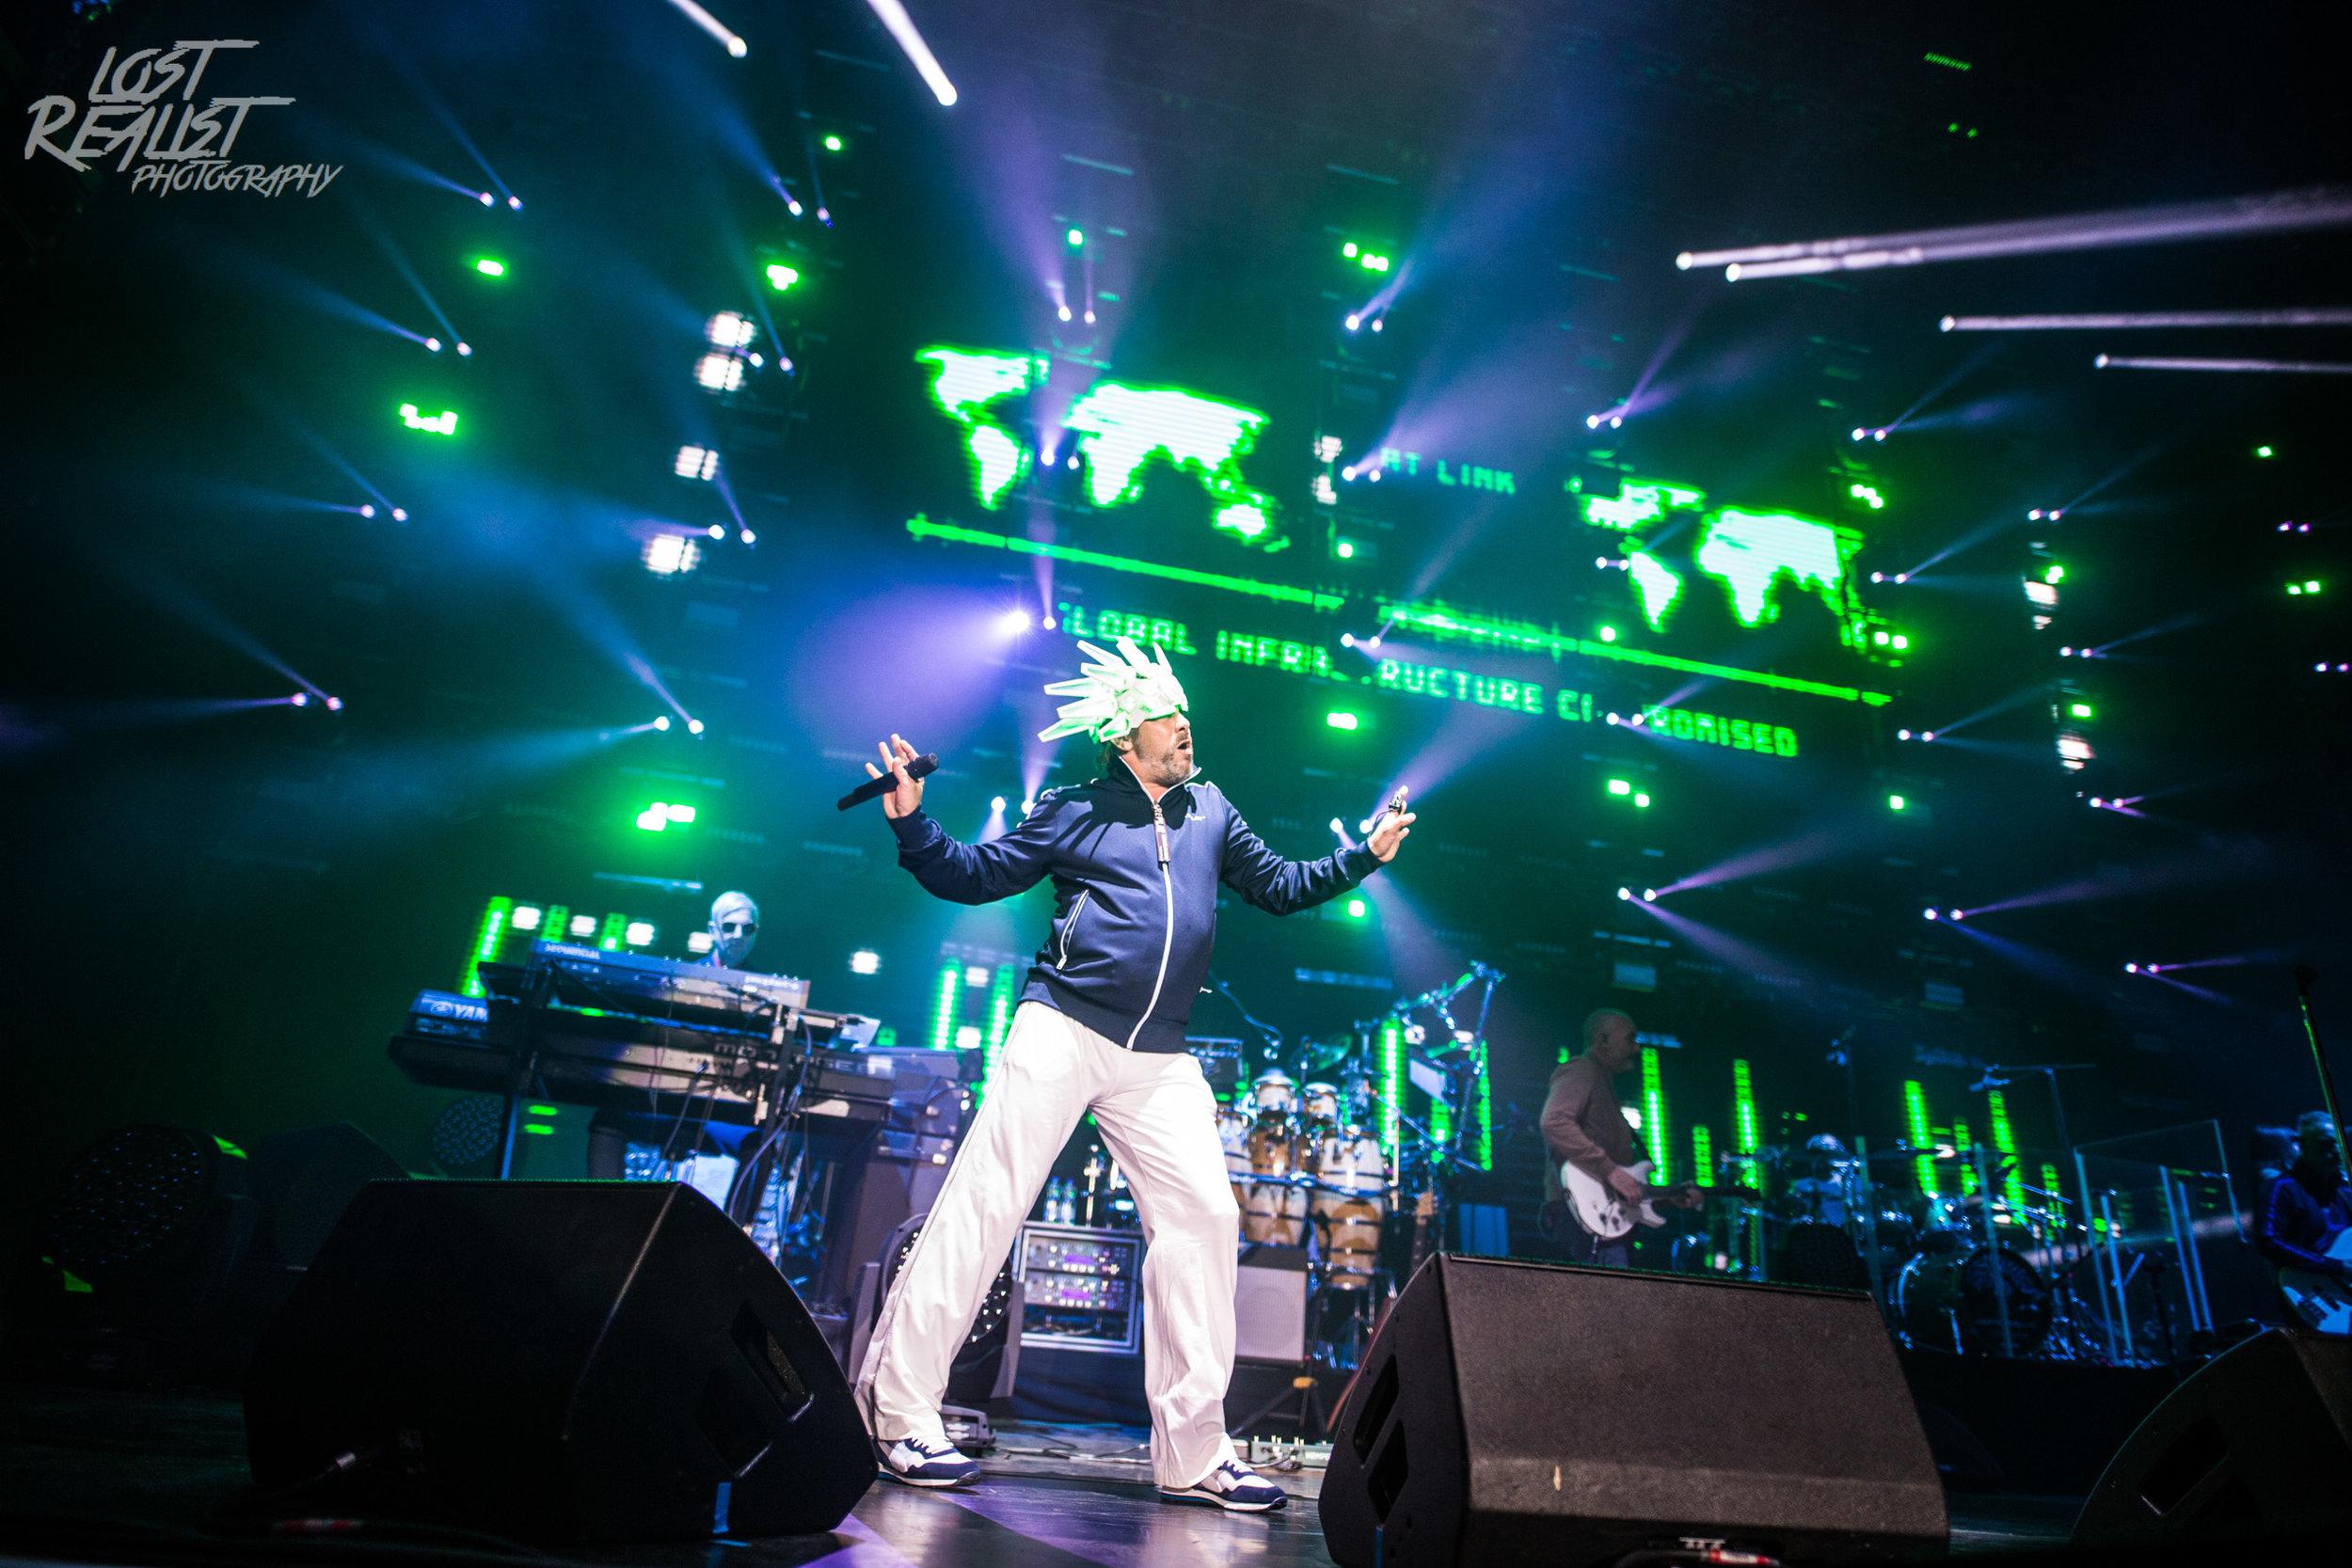 28.05.2019: JAMIROQUAI - Hamburg, Barclaycard Arena